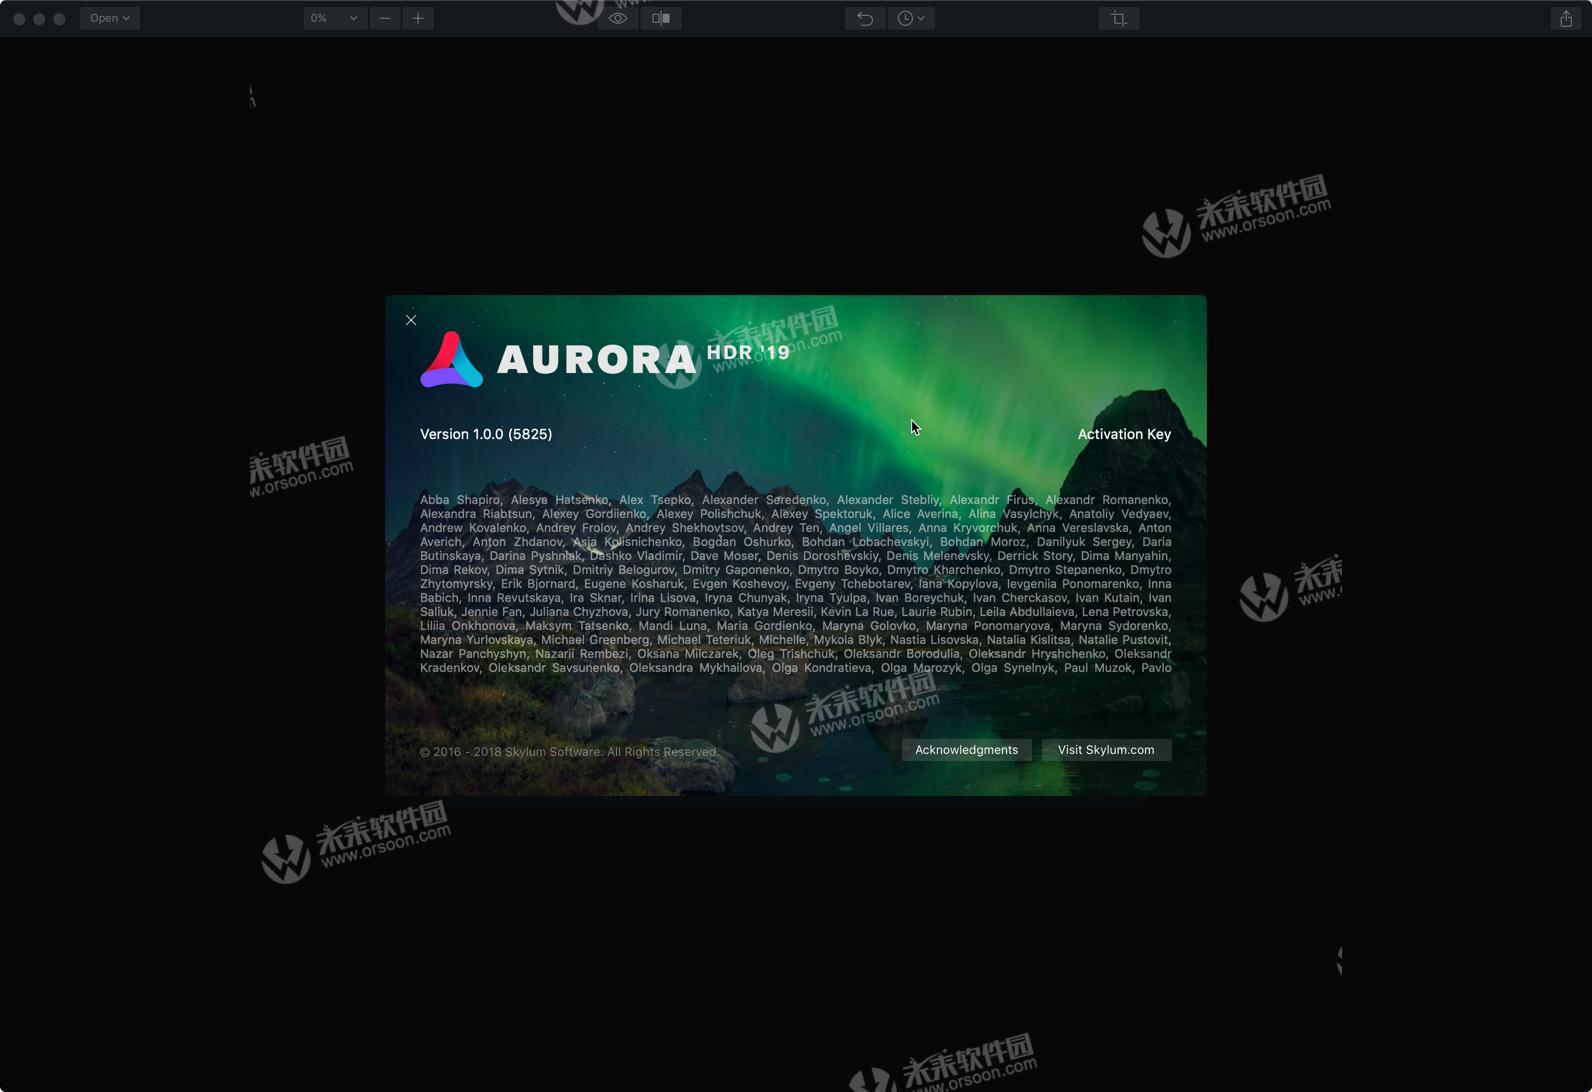 HDR image post-processing software Aurora HDR 2019 mac crack version